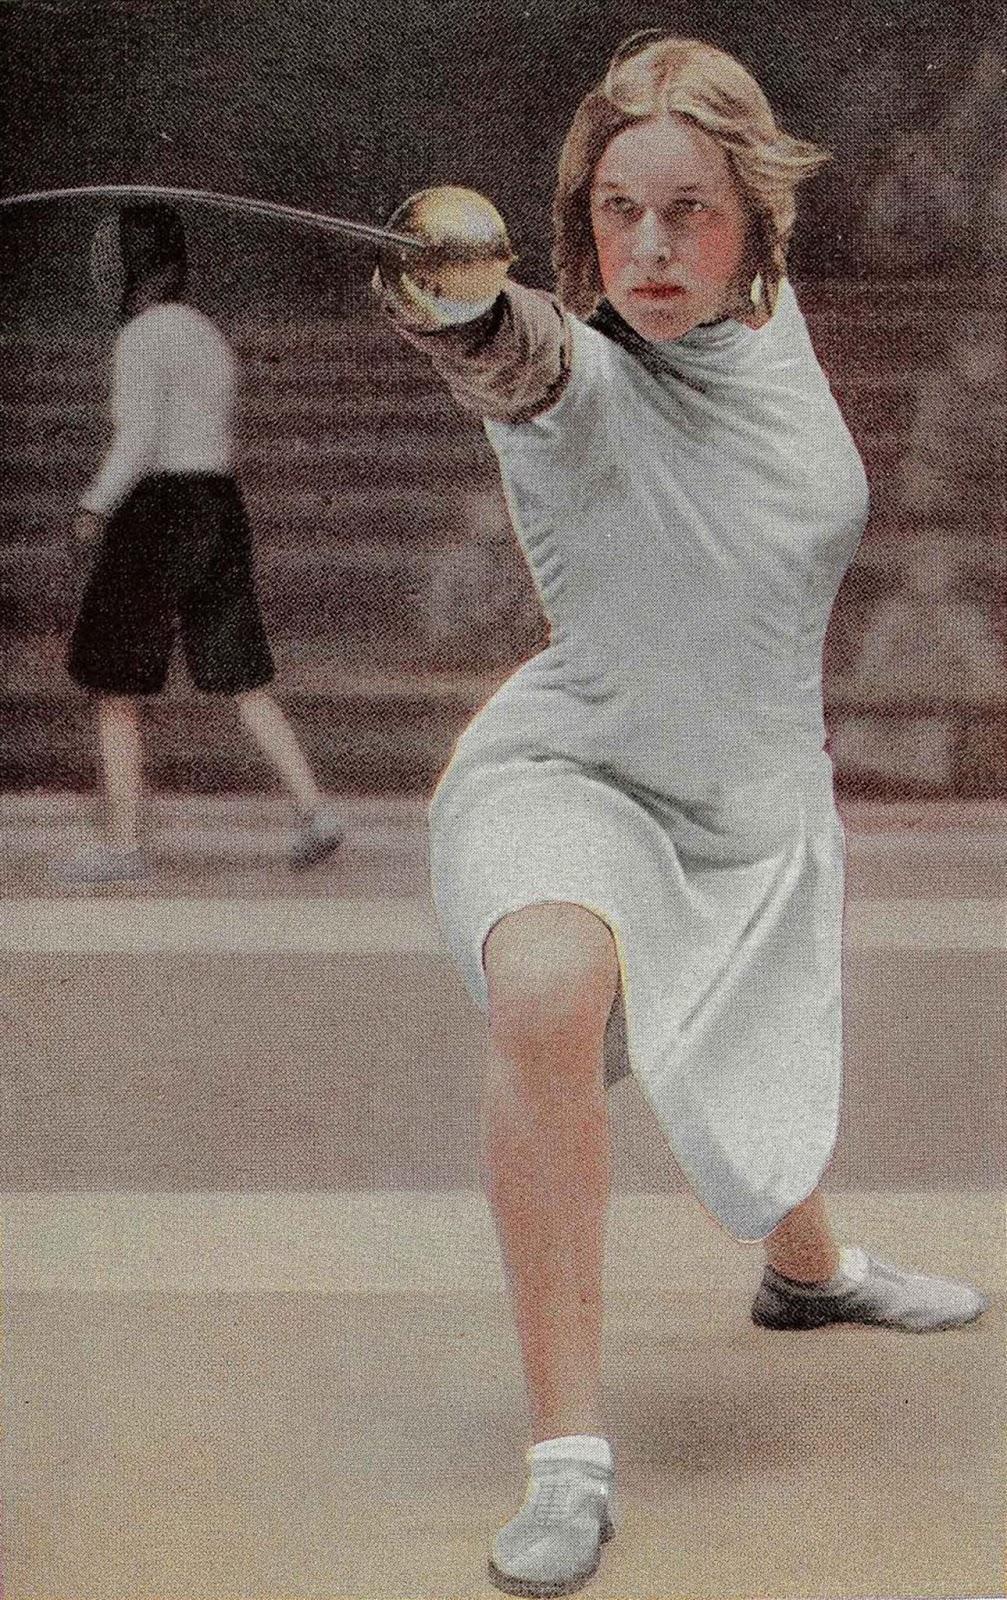 Mayer at the Los Angeles Olympics. 1932.